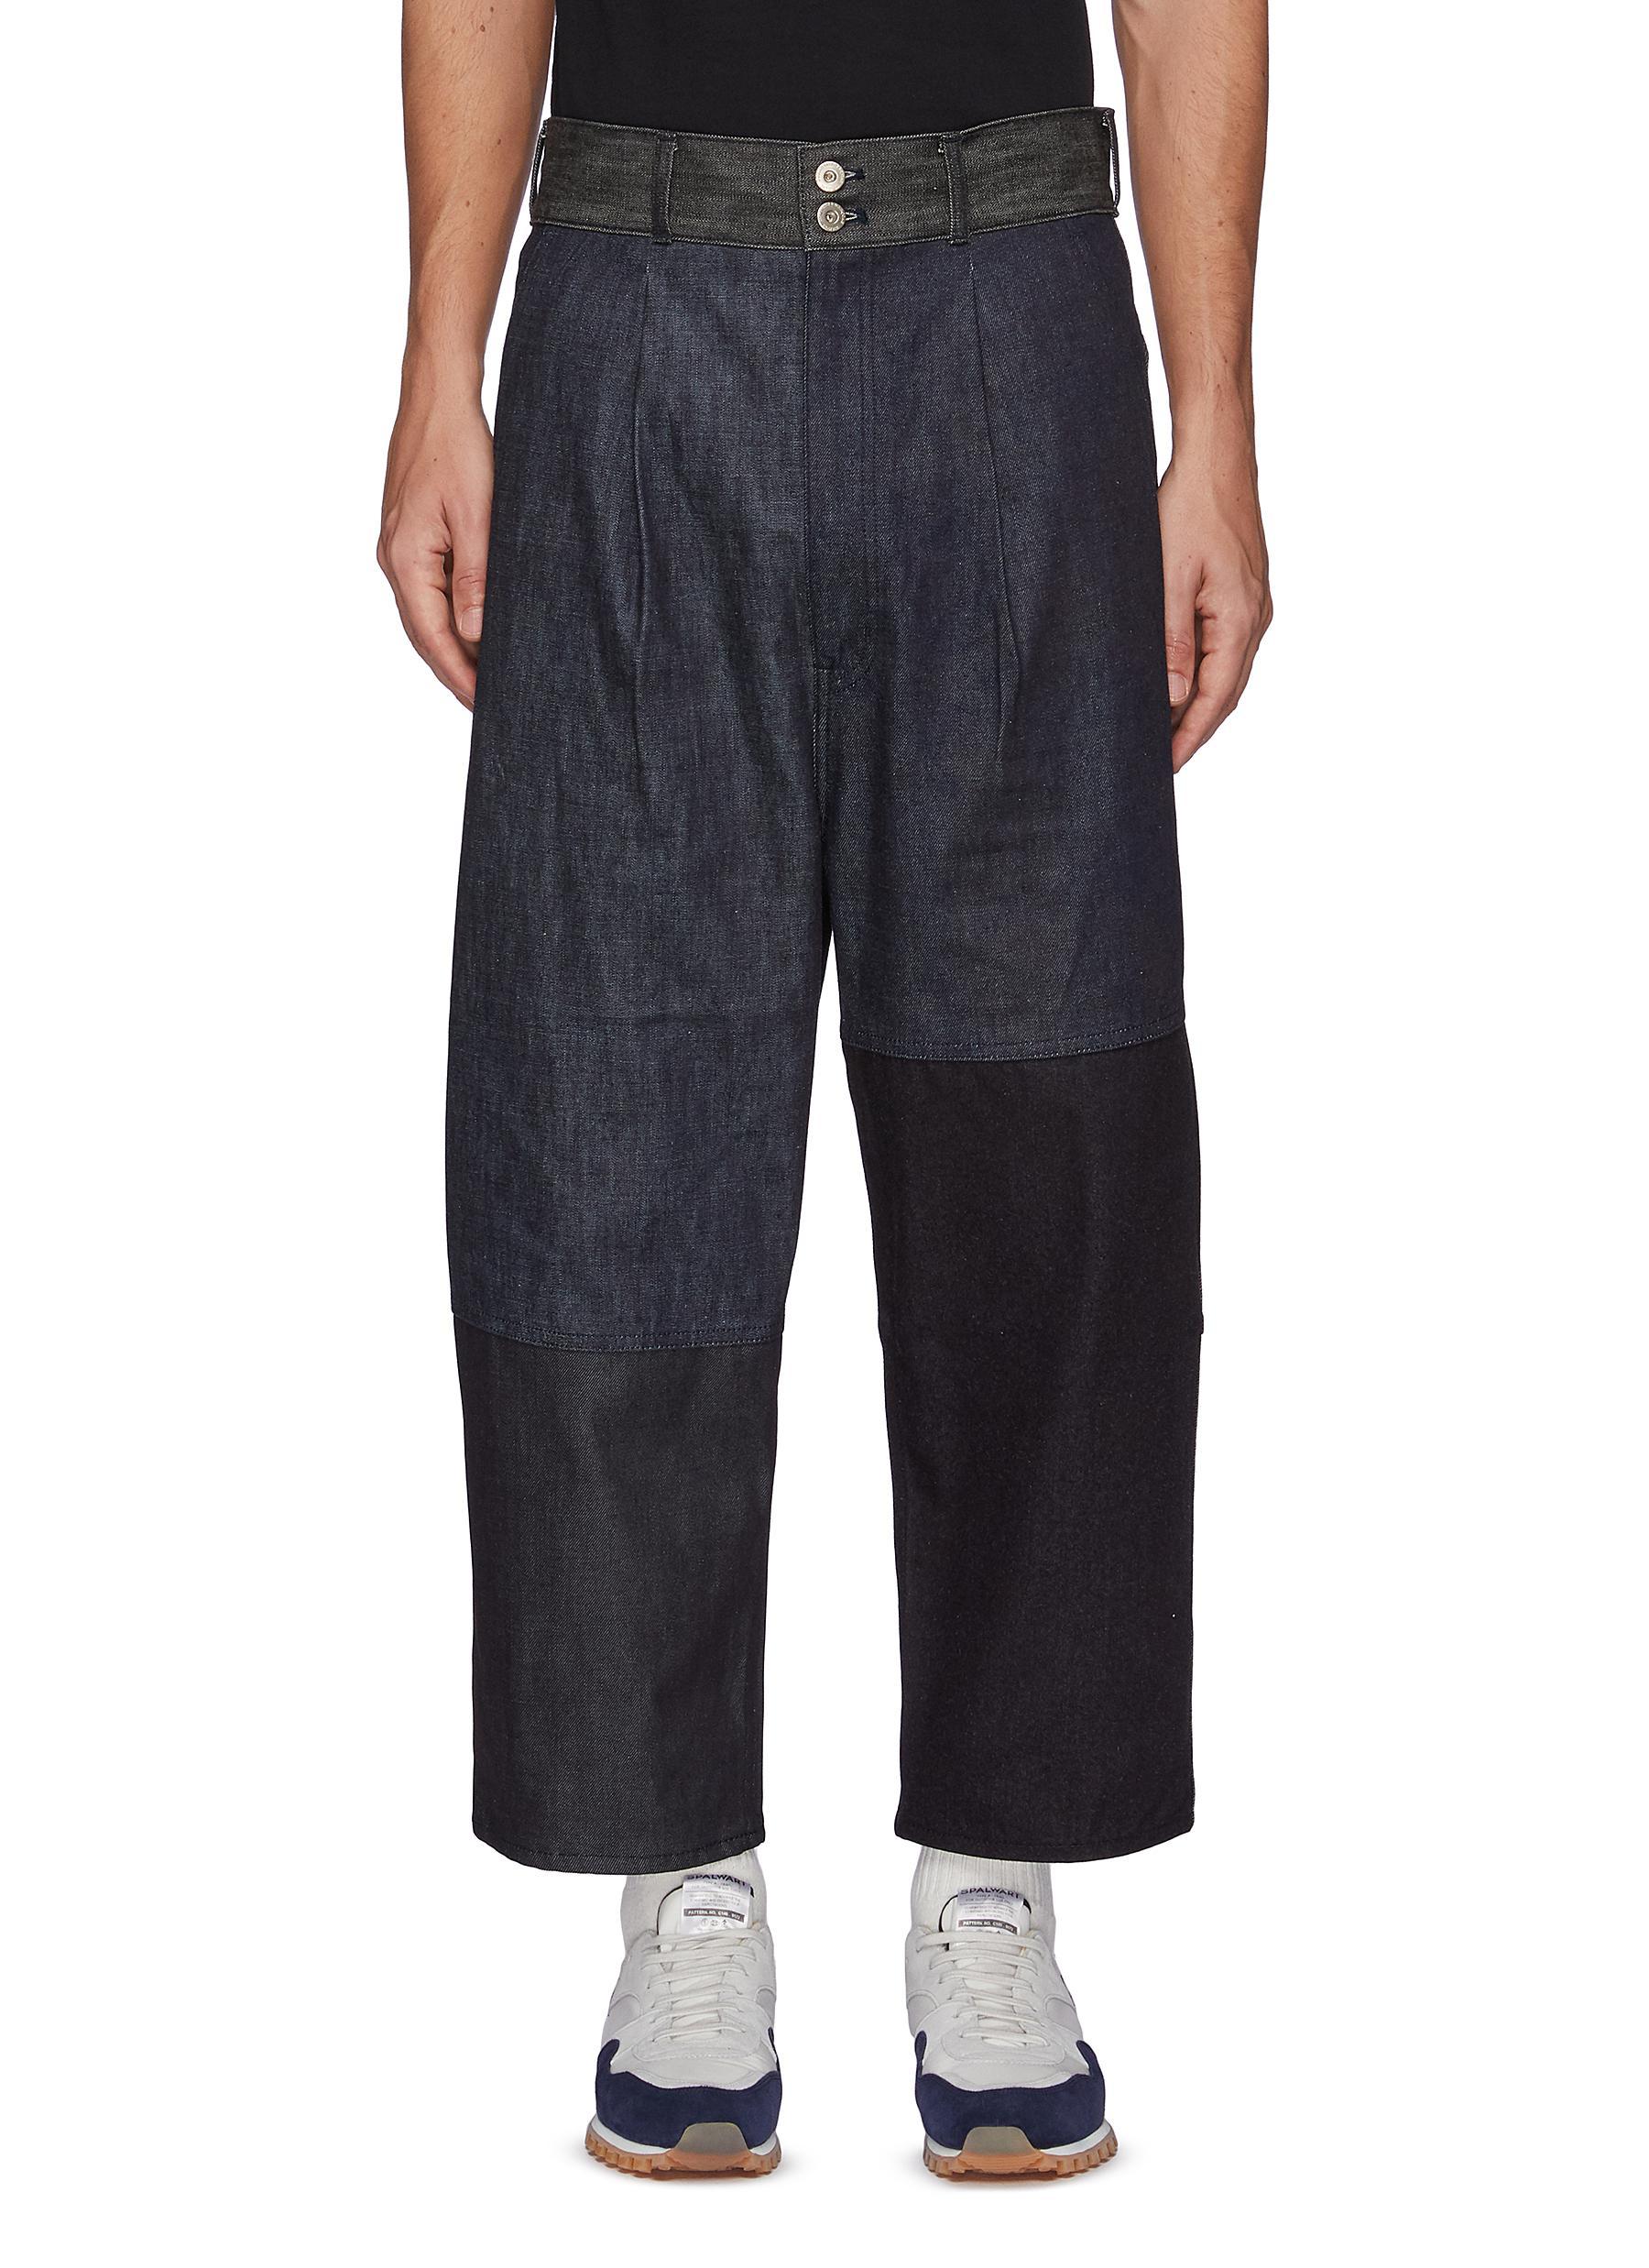 Patchwork Denim Cropped Loose Pants